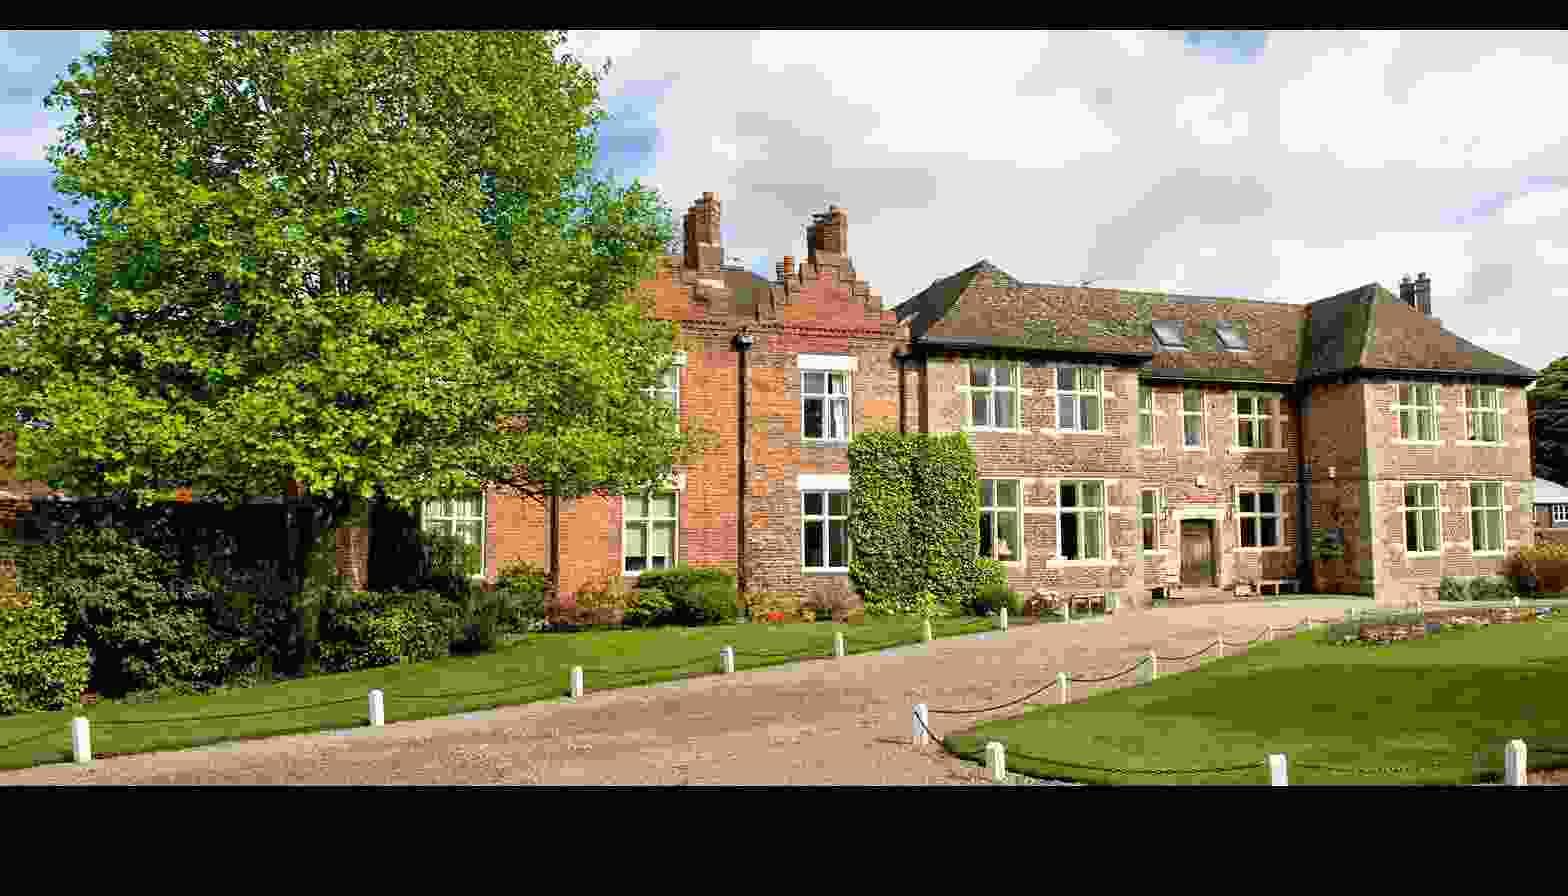 Kings summer, Moreton Hall